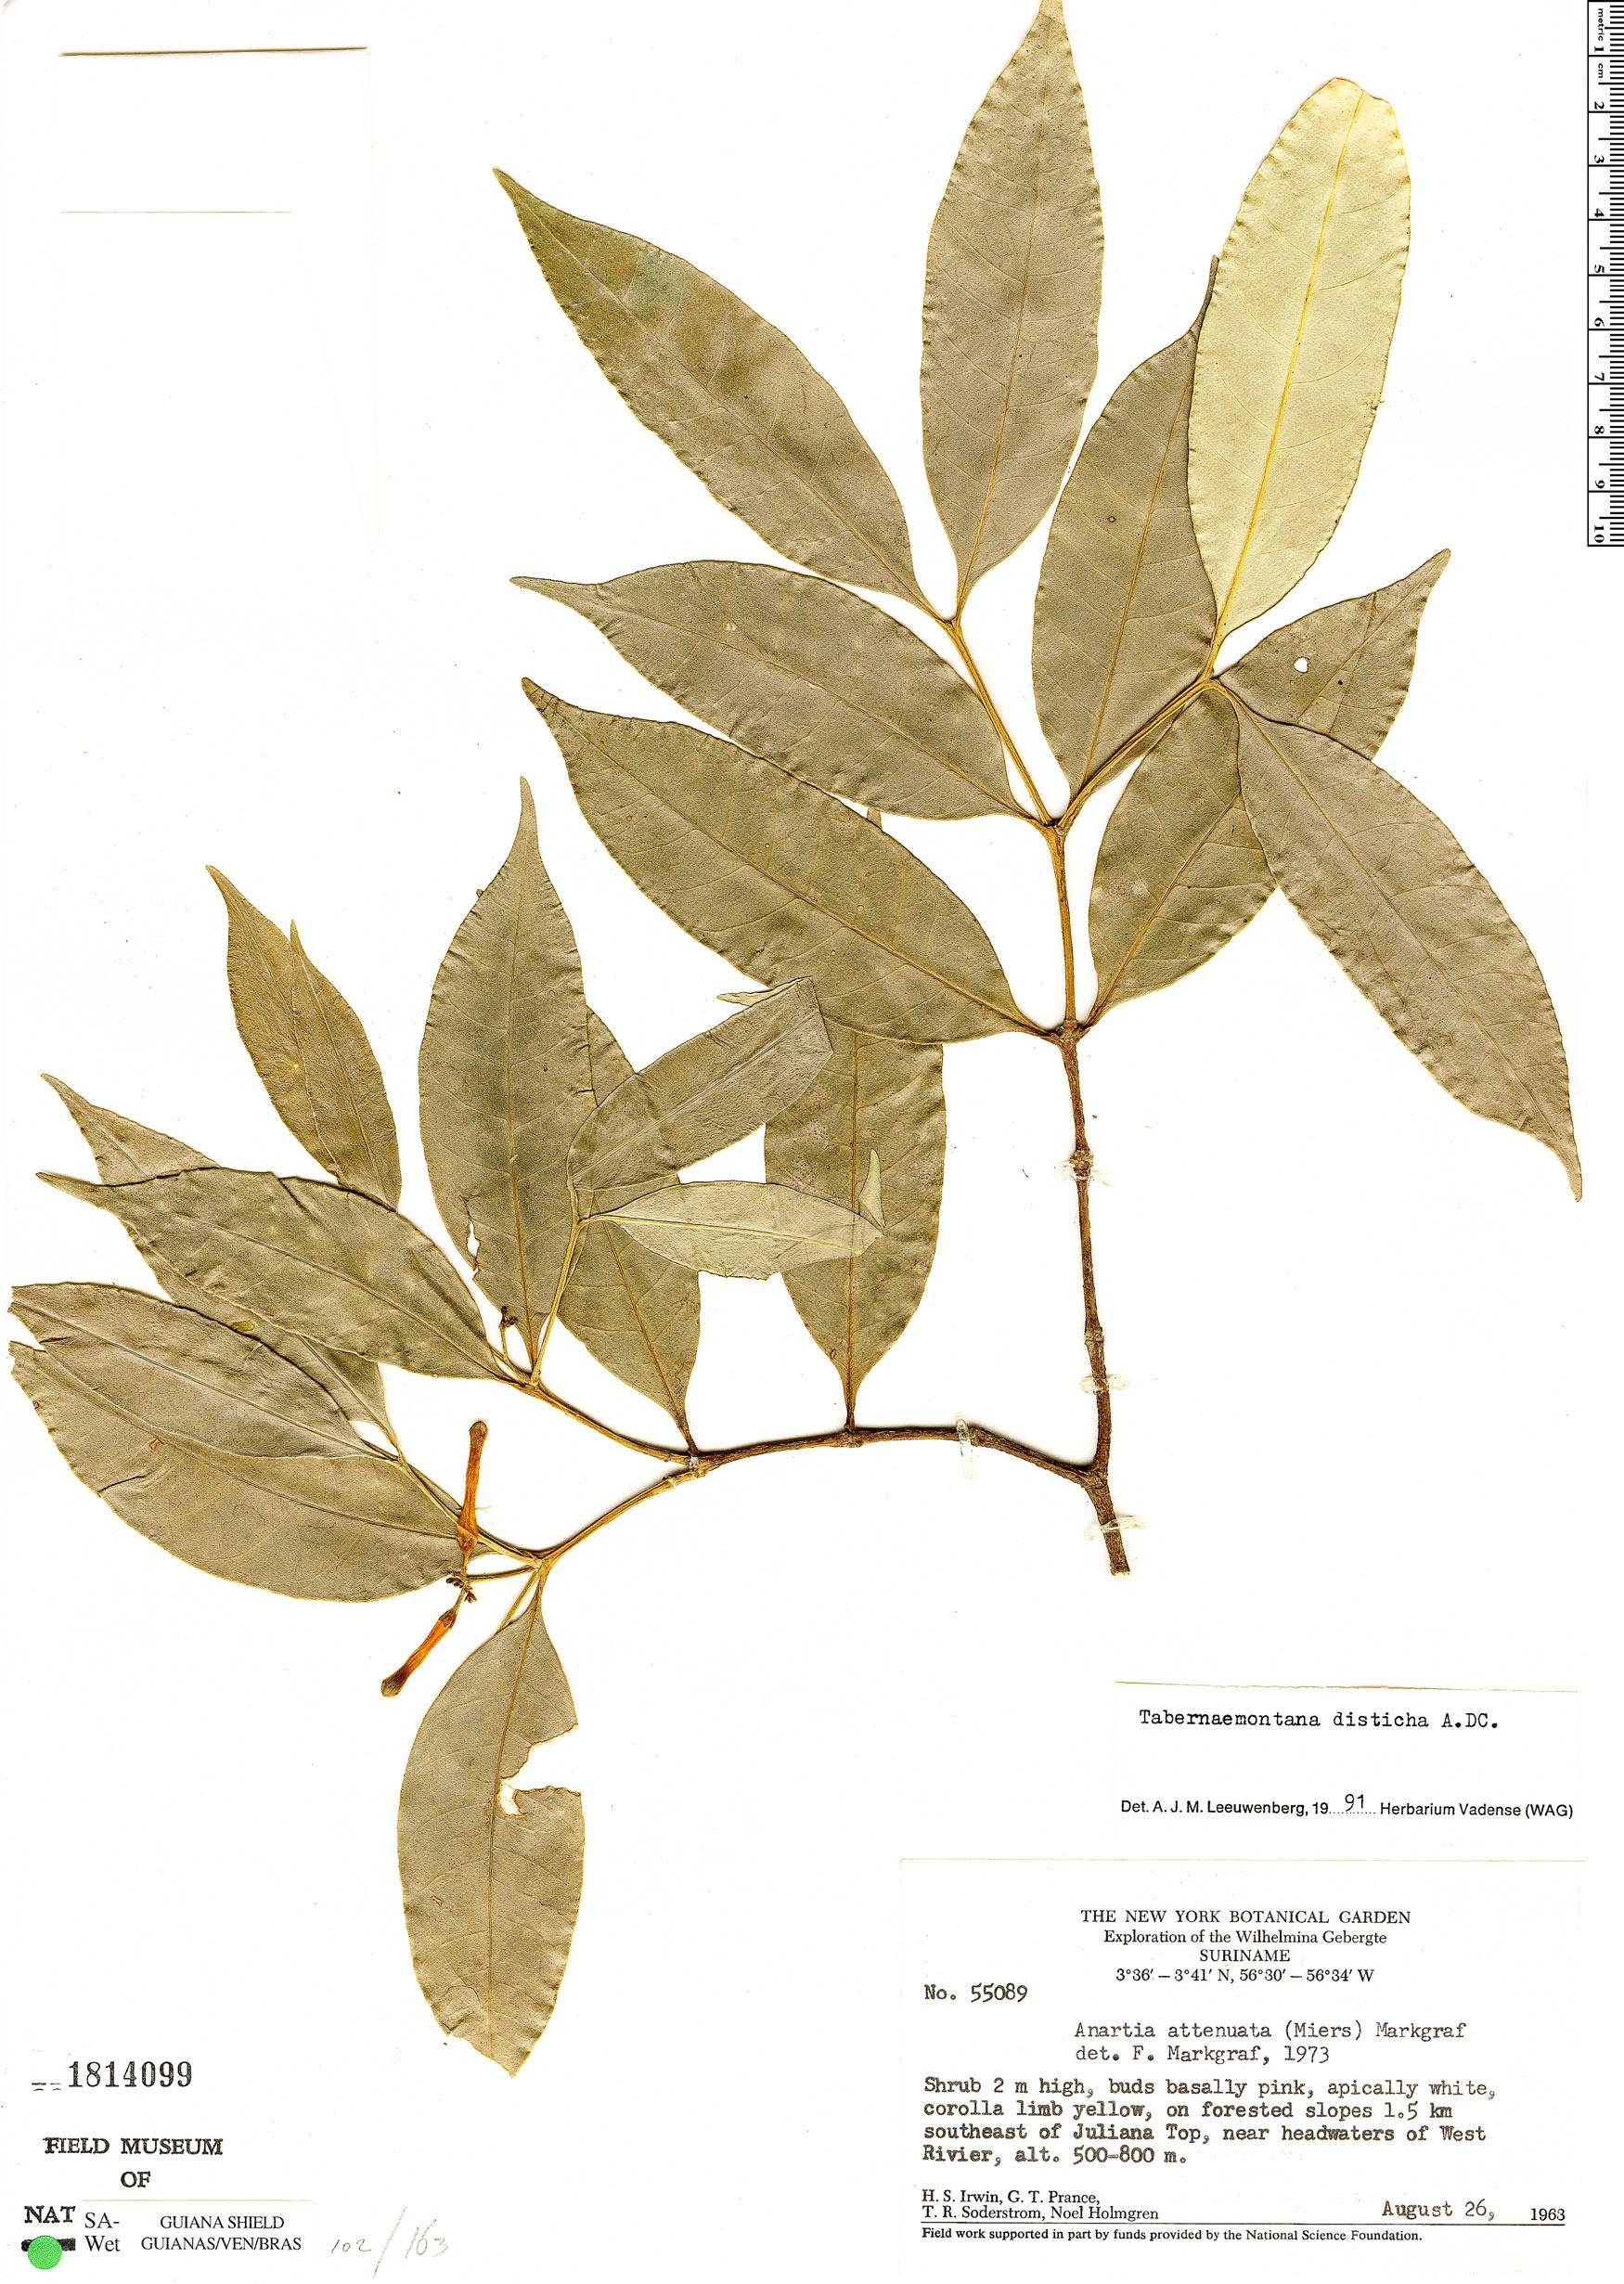 Specimen: Tabernaemontana disticha